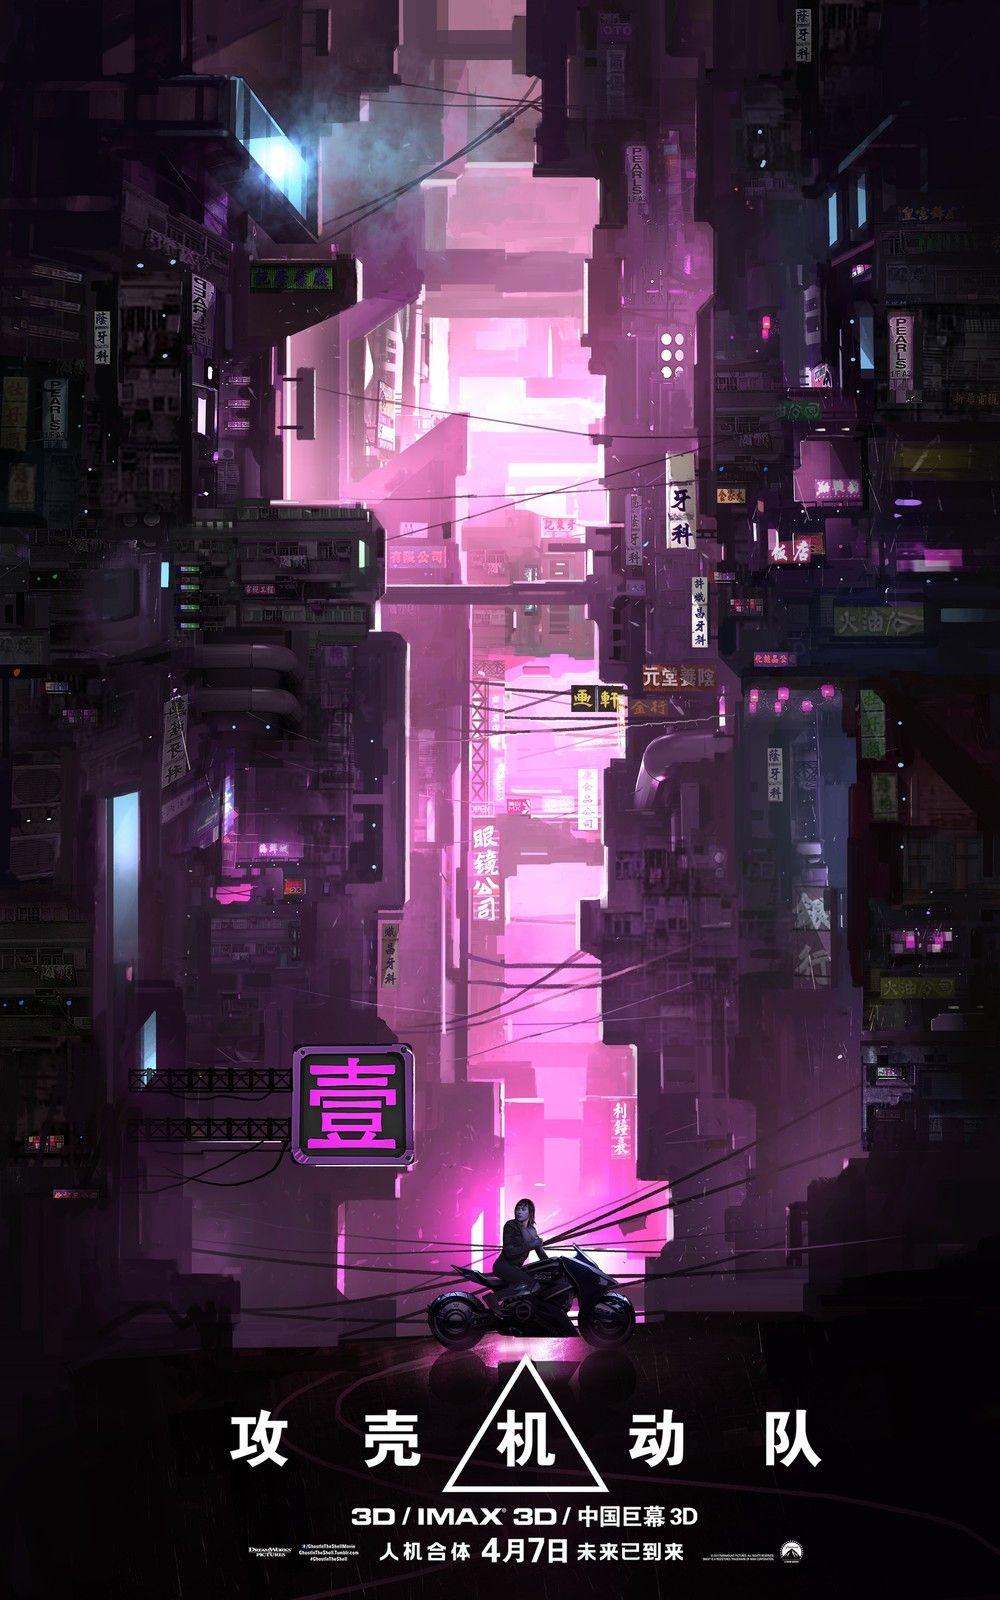 Ghost In The Shell 一 手指断了 A On Artstation At Https Www Artstation Com Artwork Opk2j Cyberpunk City Ghost In The Shell Futuristic City